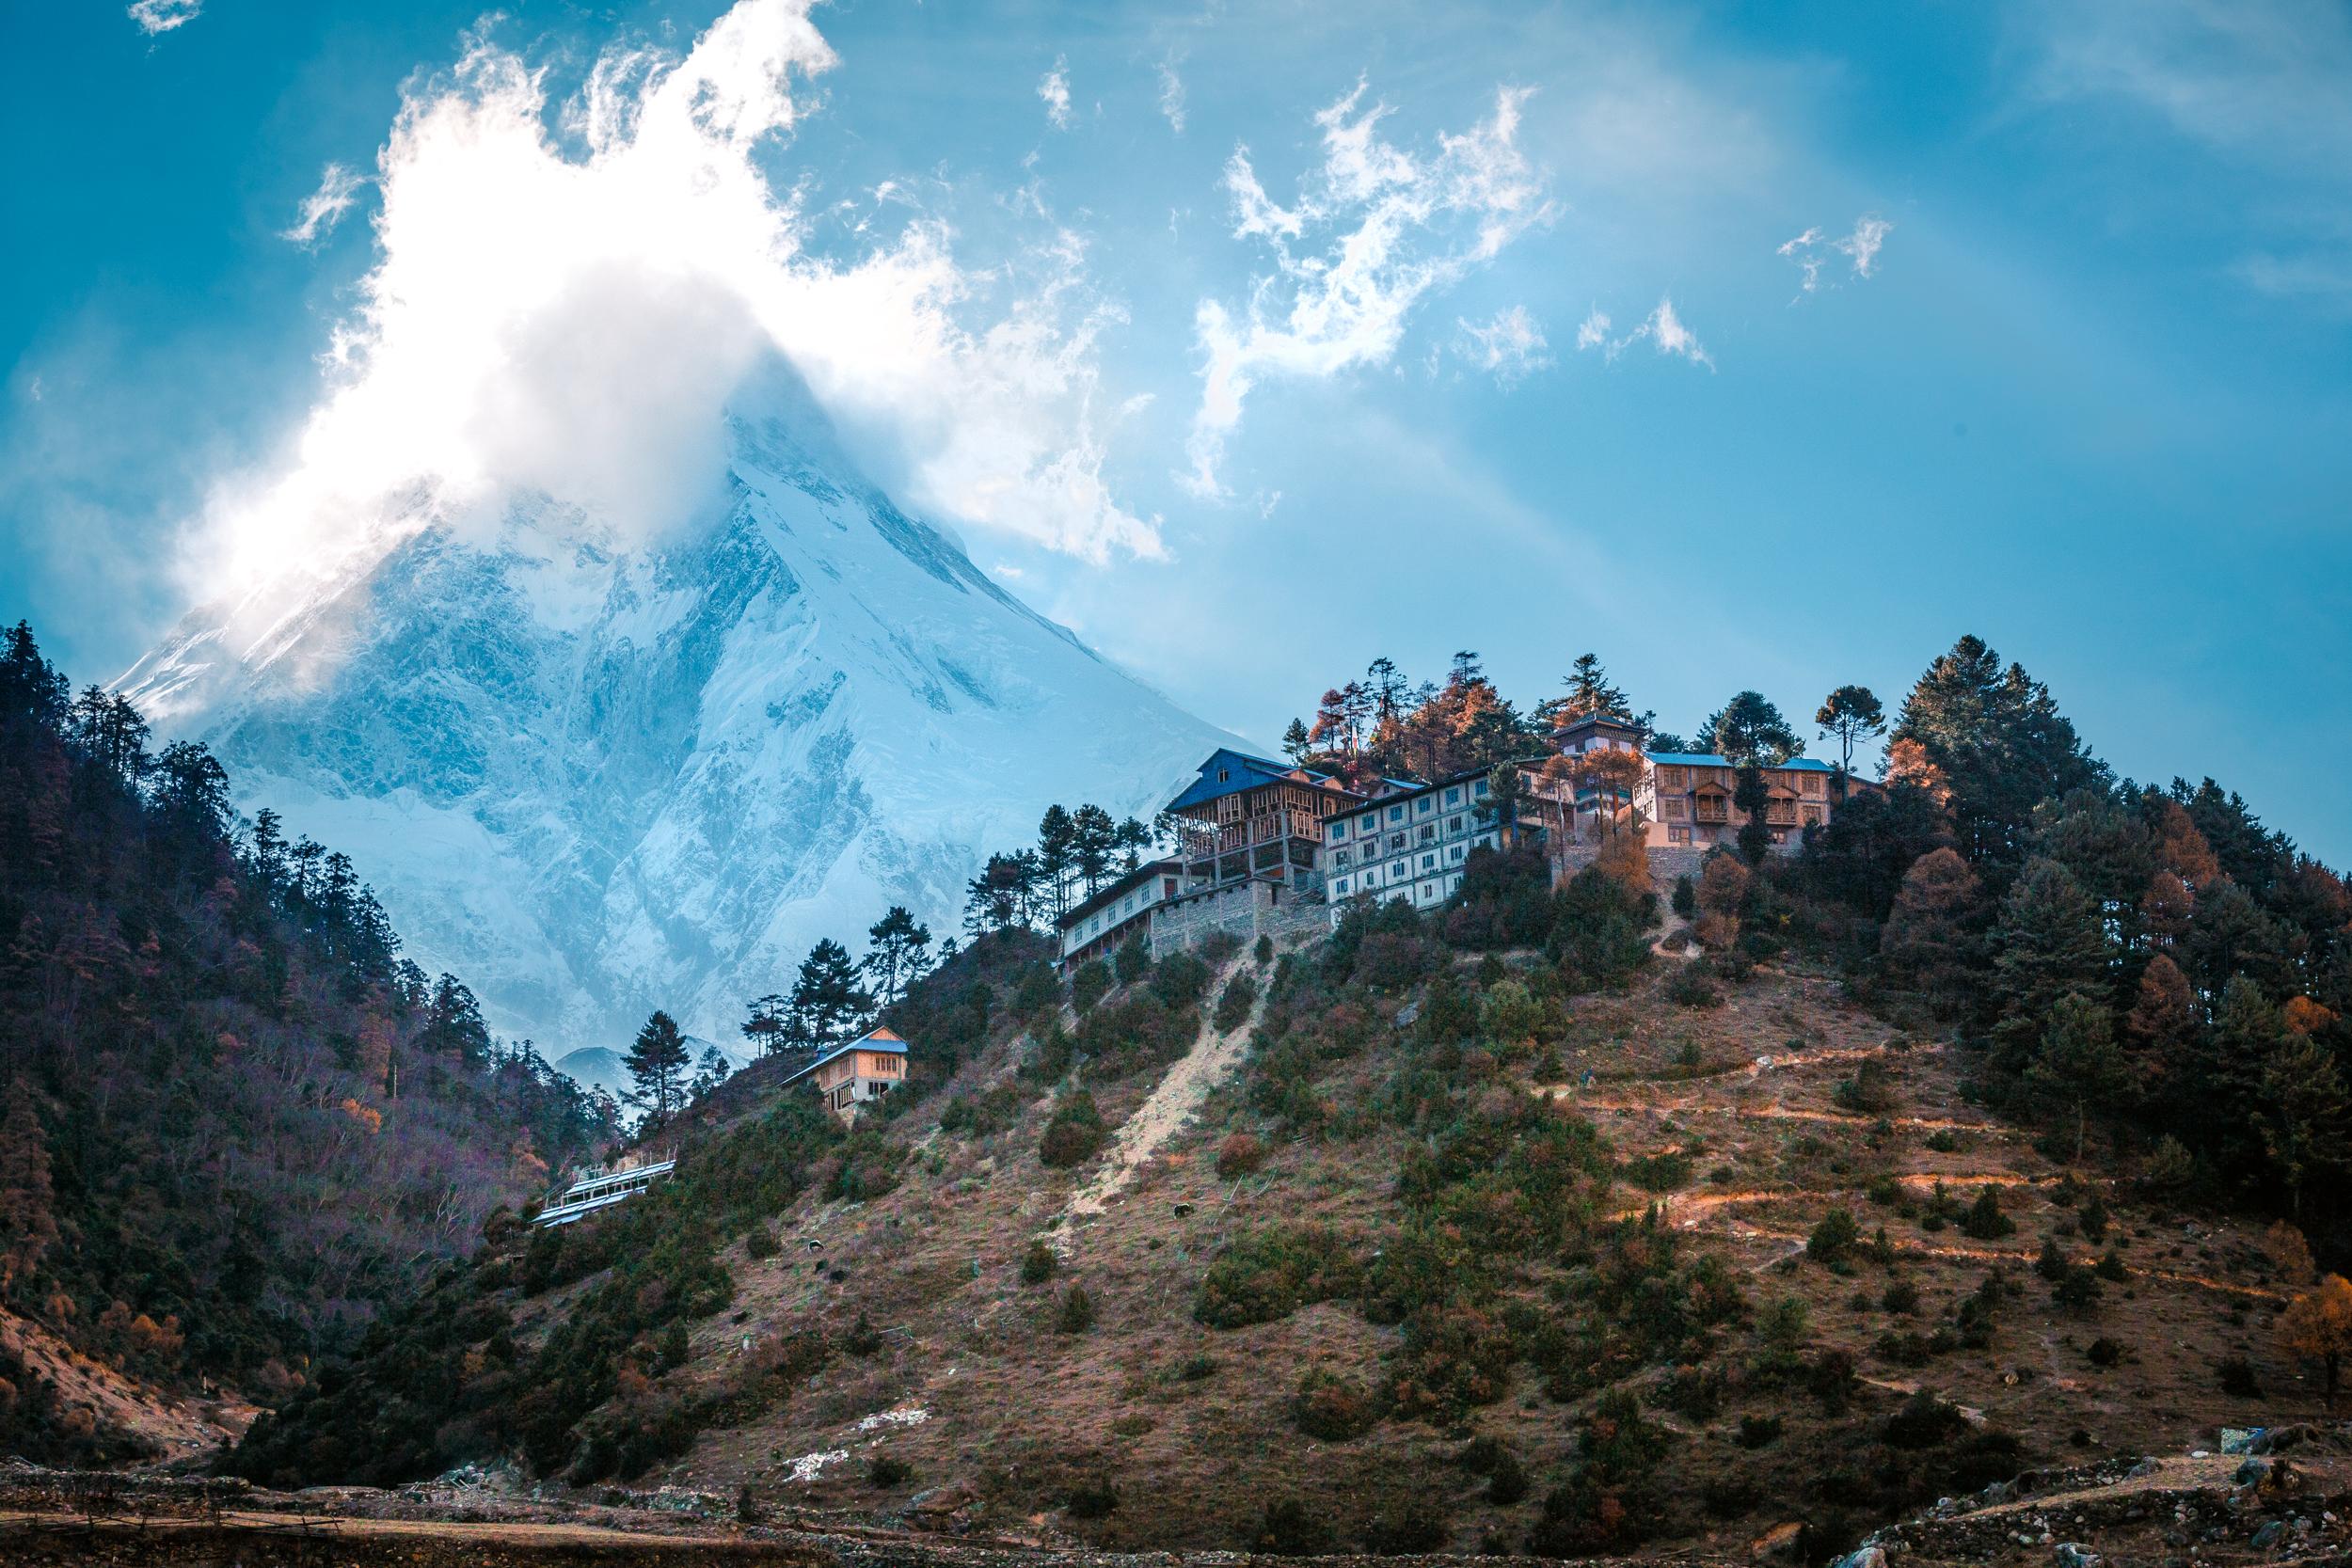 Mt. Manaslu (8,106m) smoking above the village of Lho.